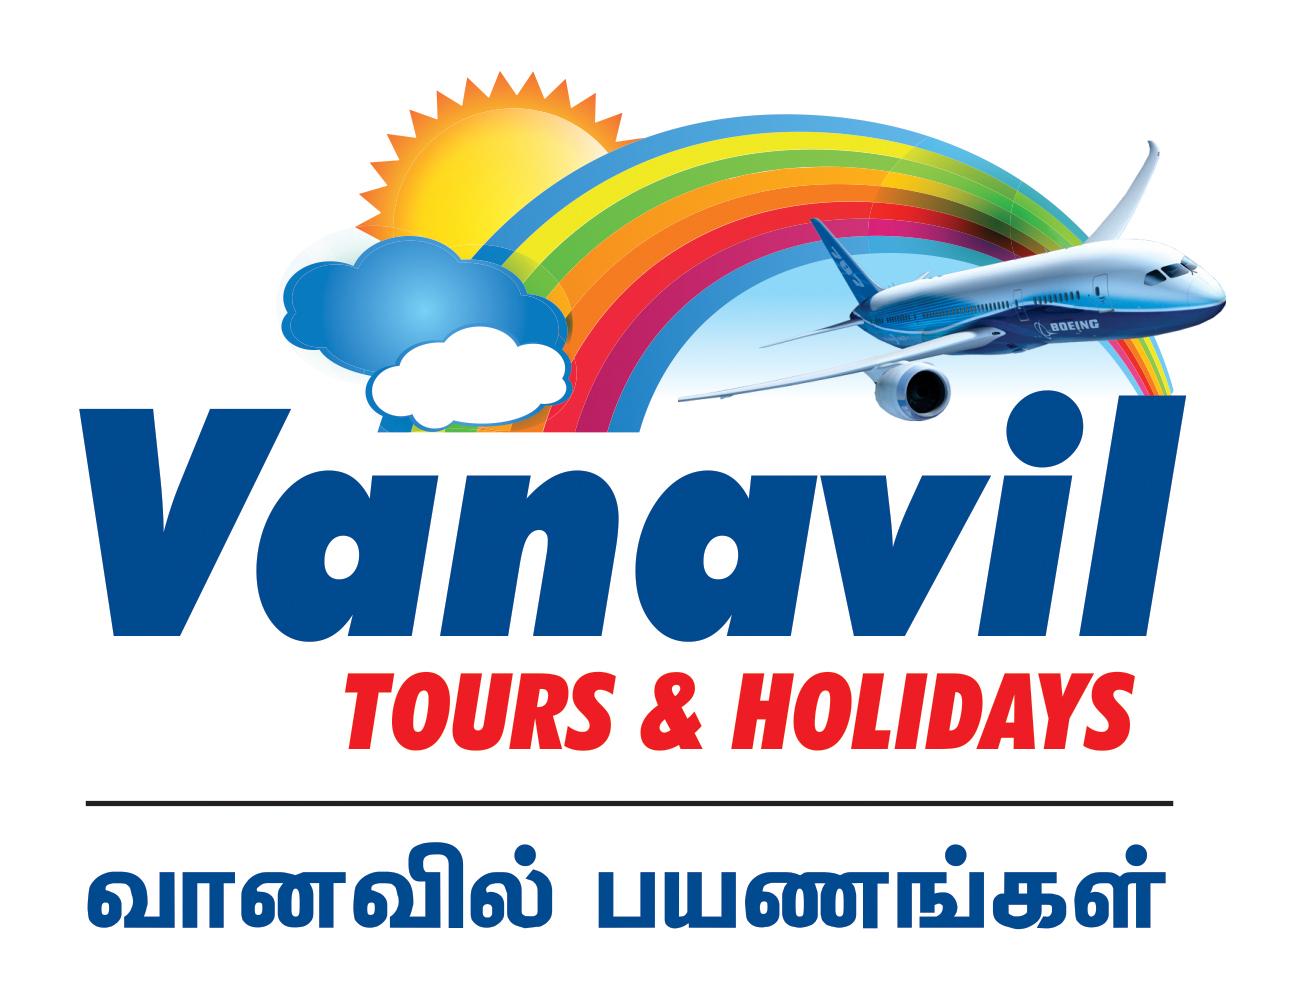 Vanavil Tours & Holidays